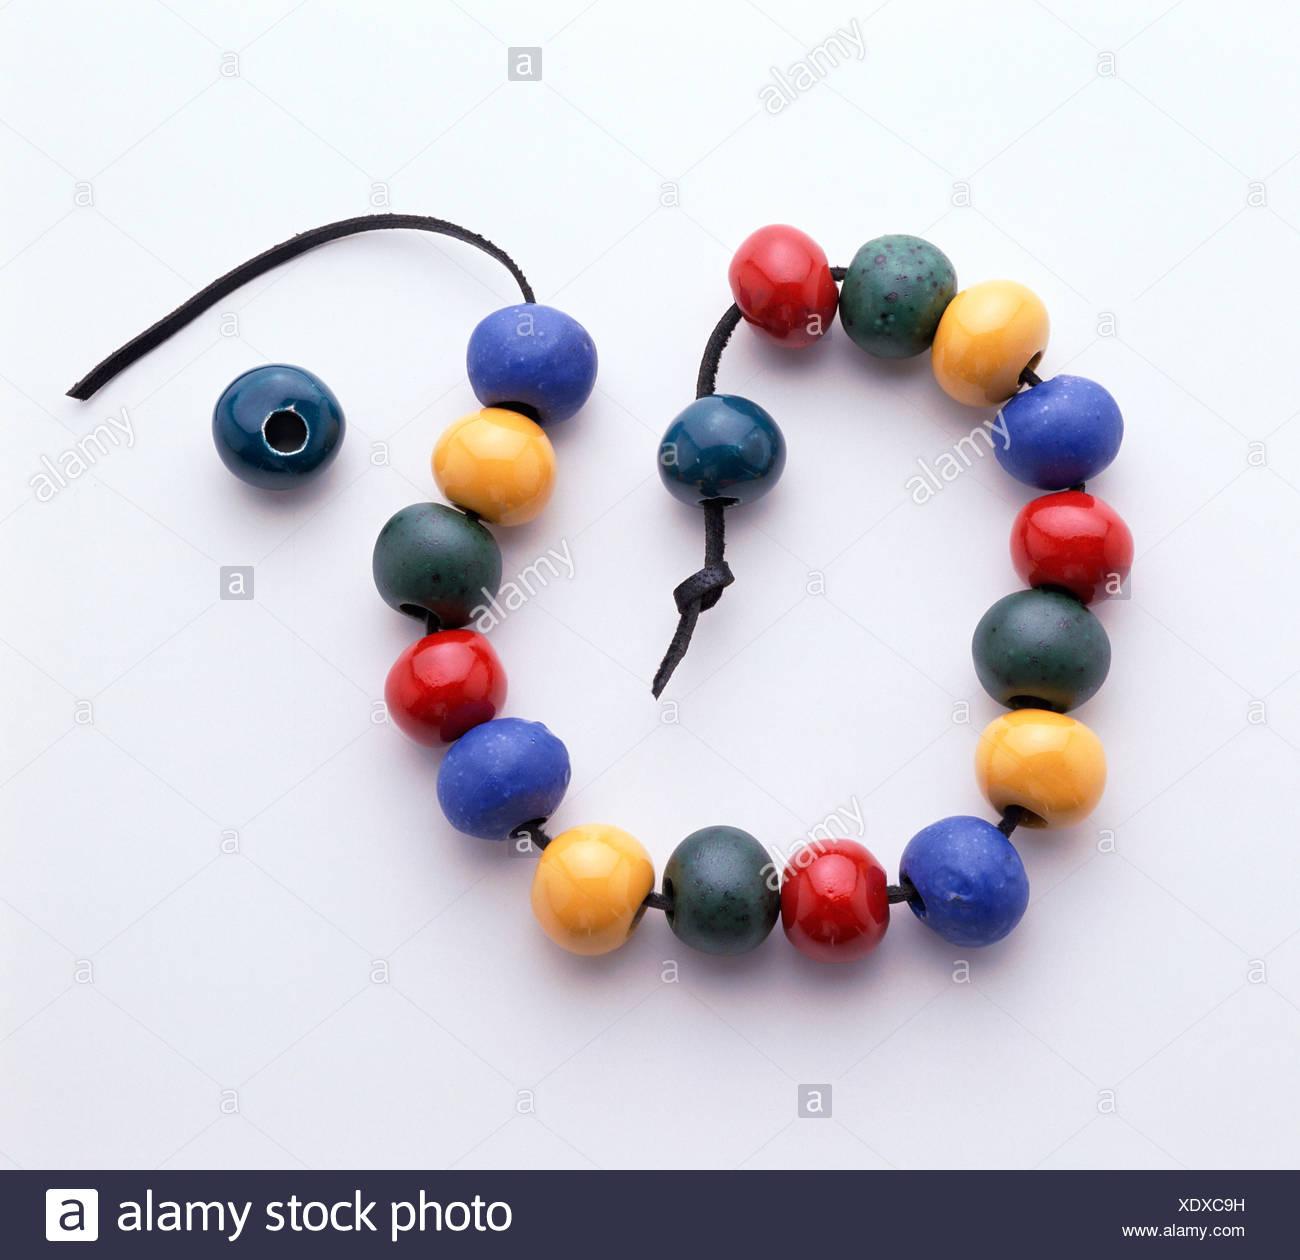 Beads - Stock Image